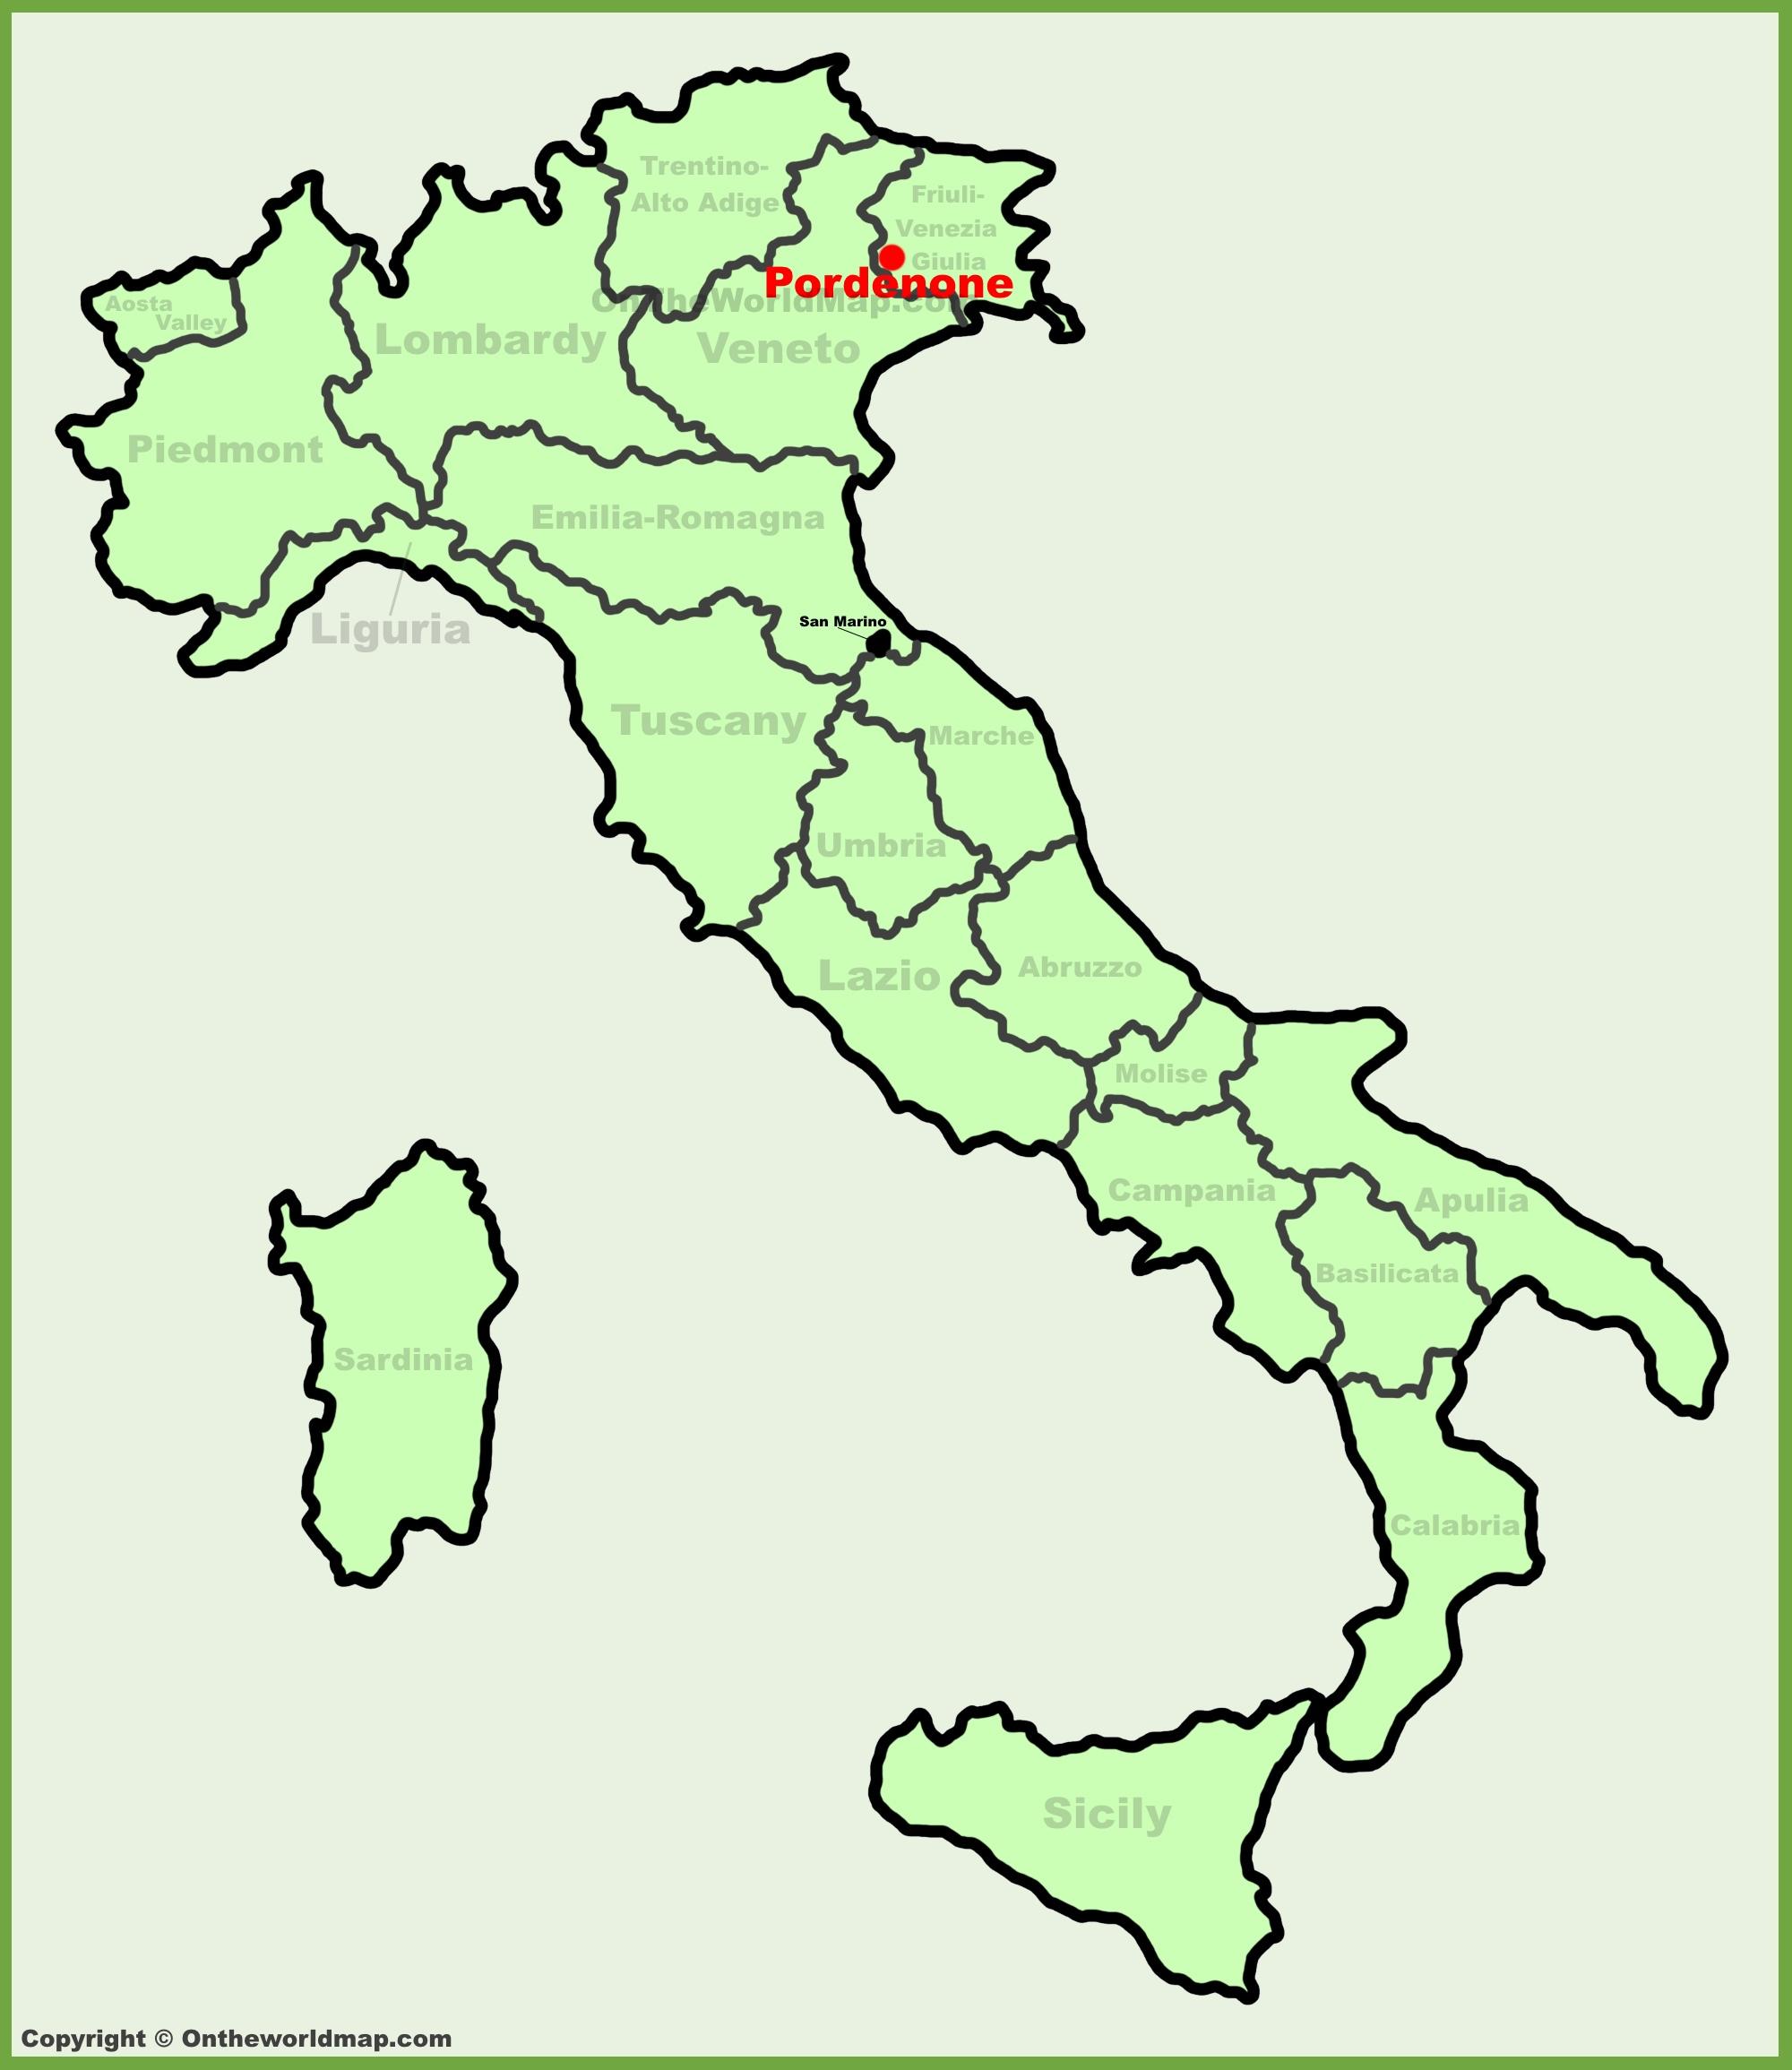 Pordenone Location On The Italy Map